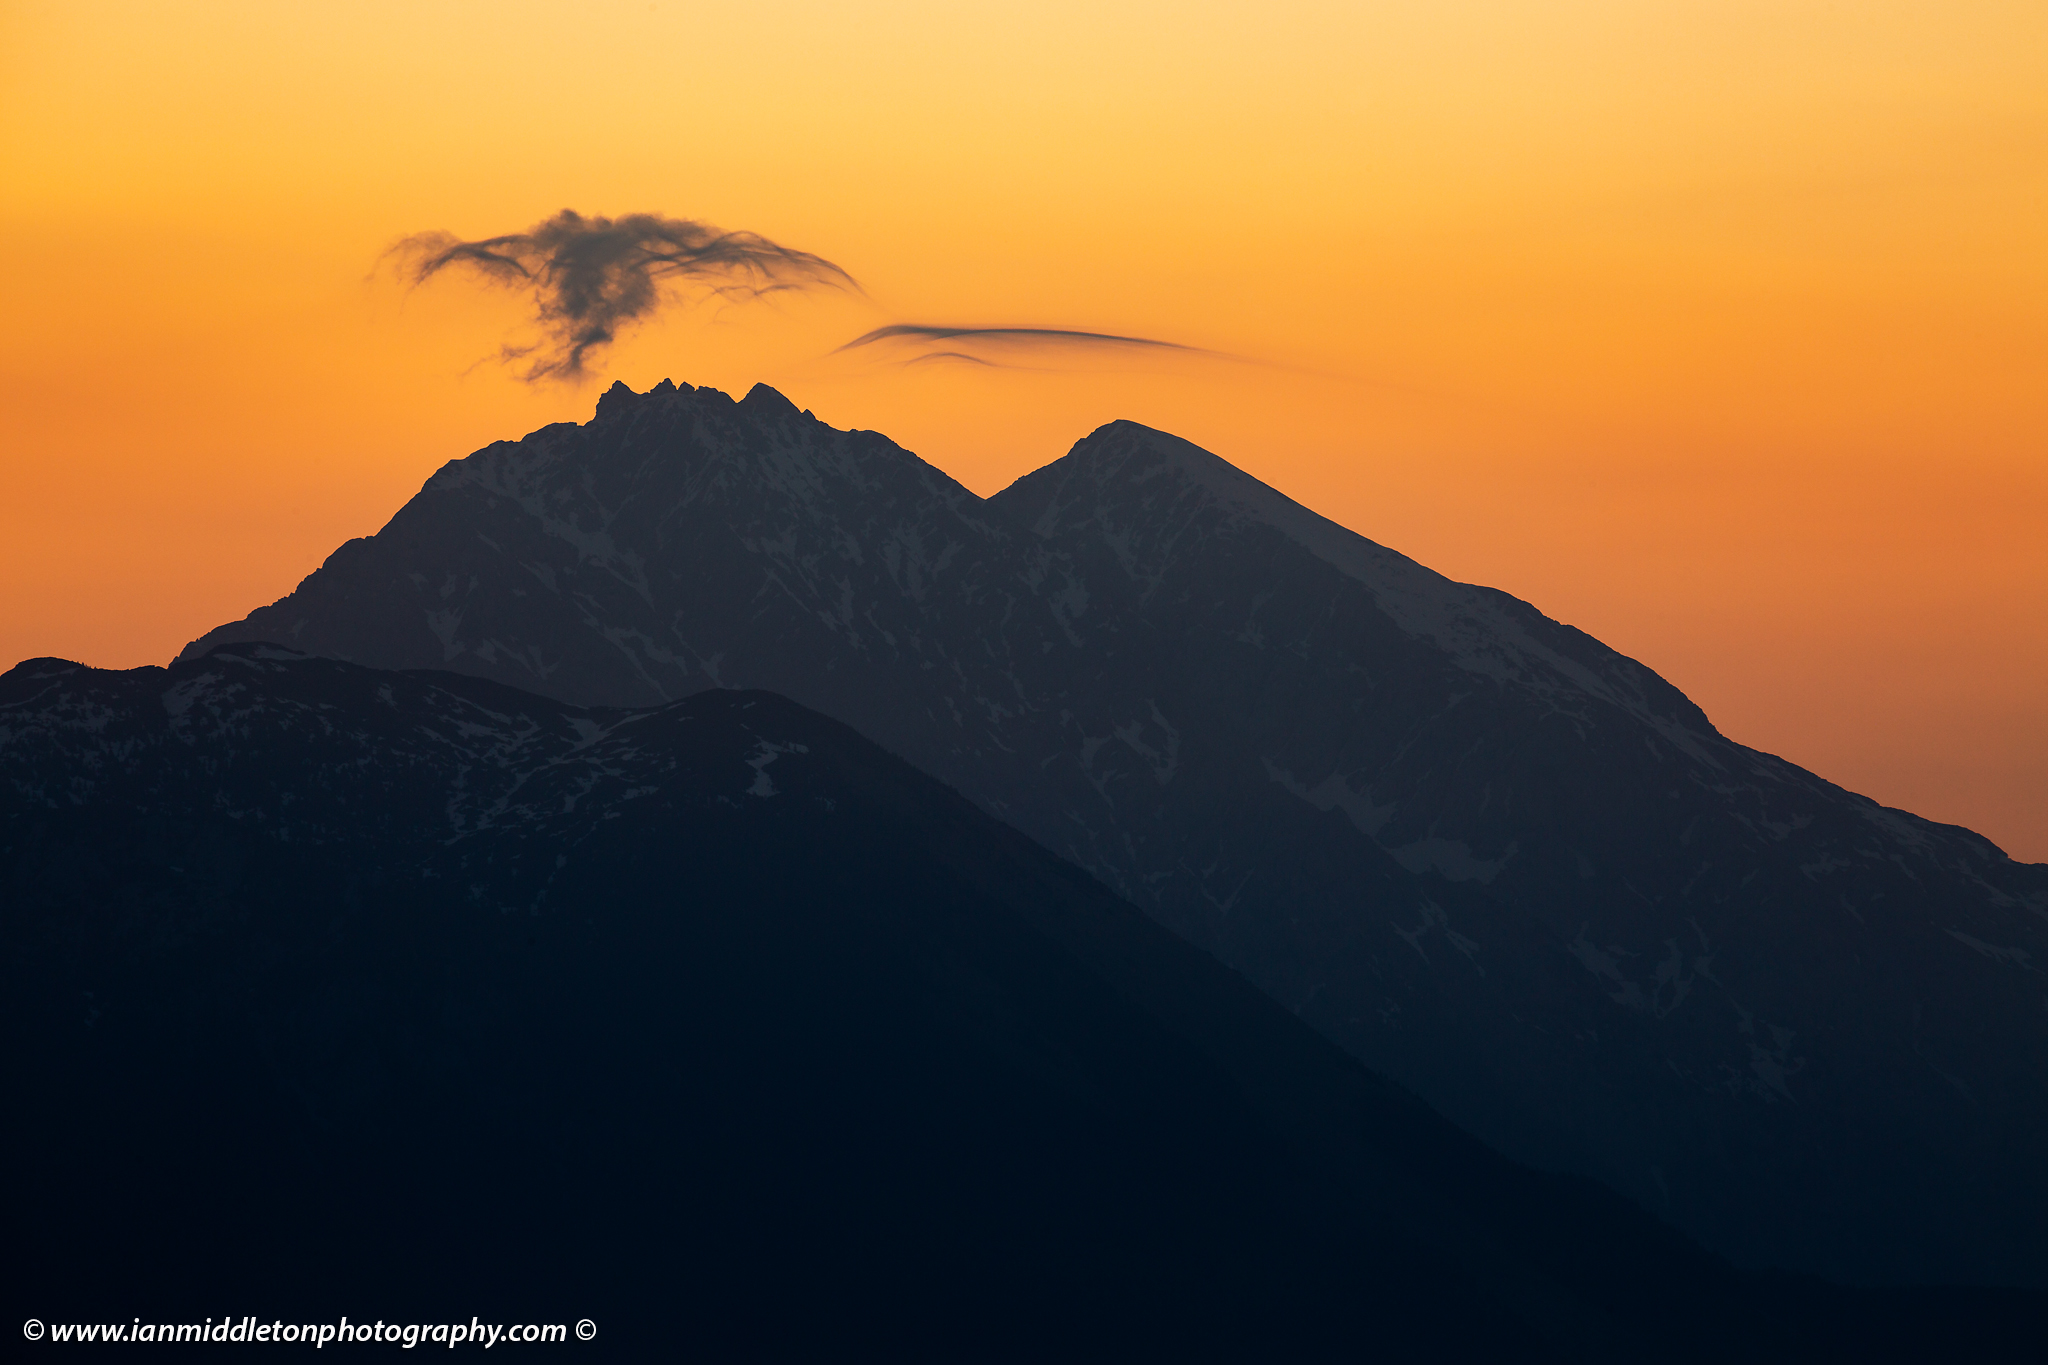 Mountain peak at sunrise, Kamnik Alps, Slovenia.